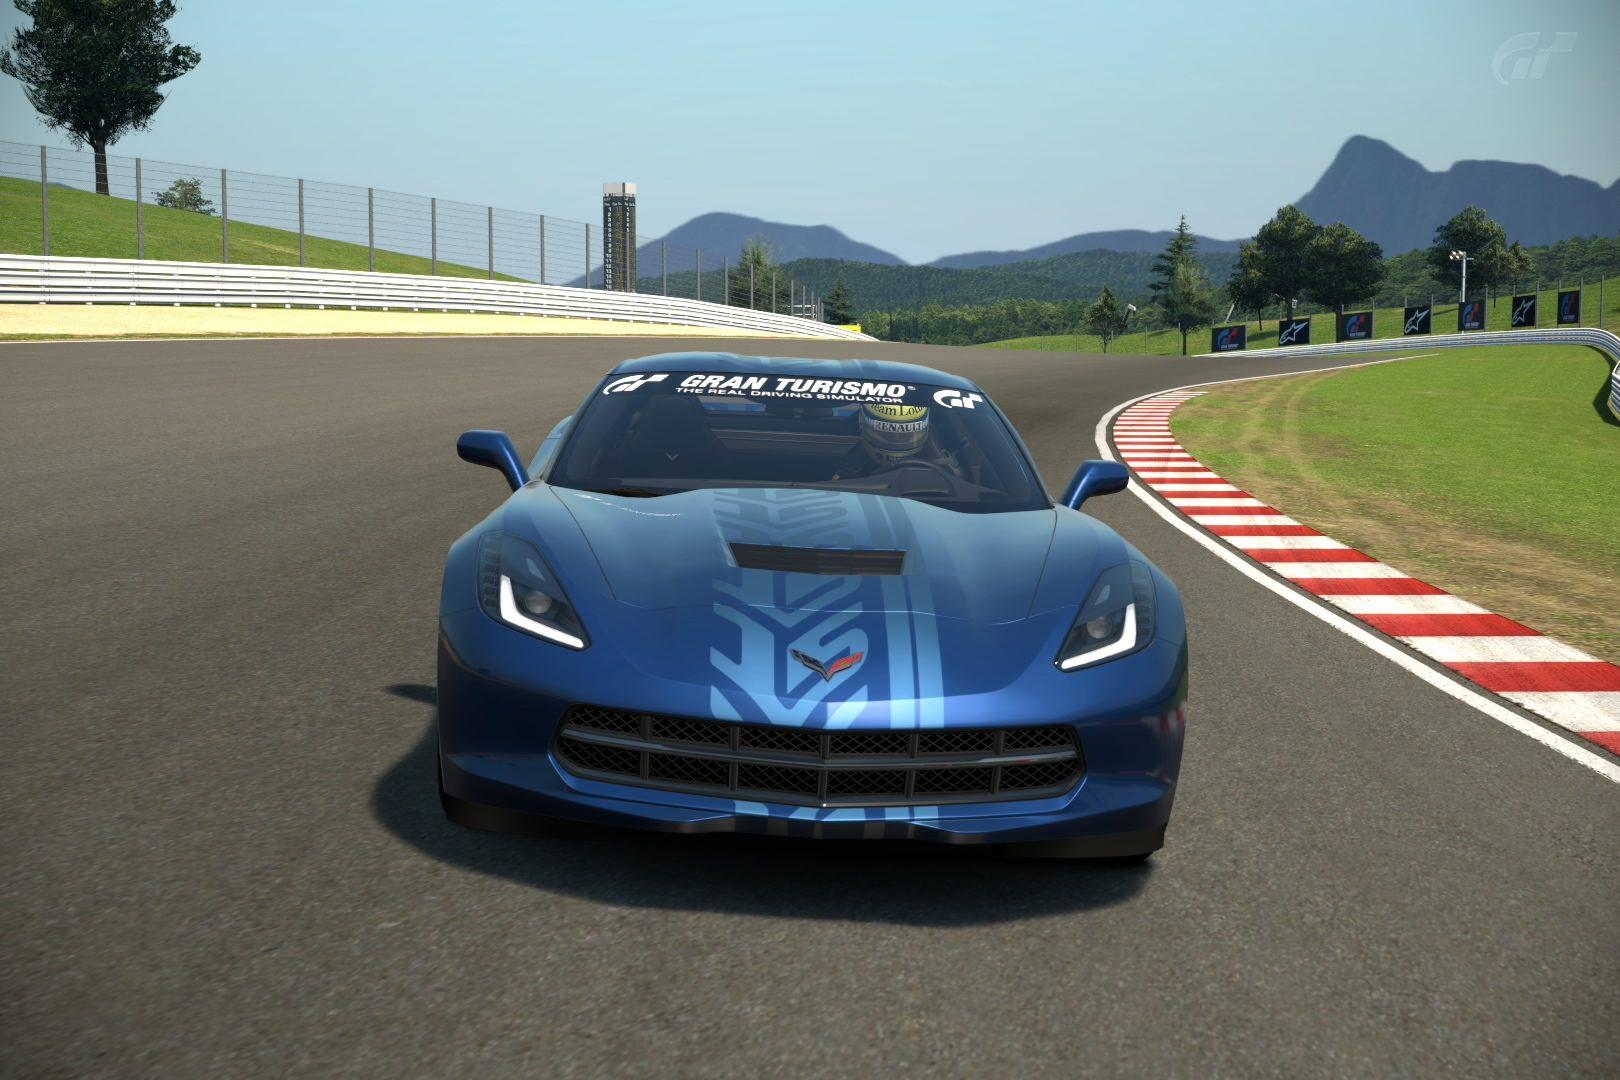 CorvetteStingrayAEImg3.jpg